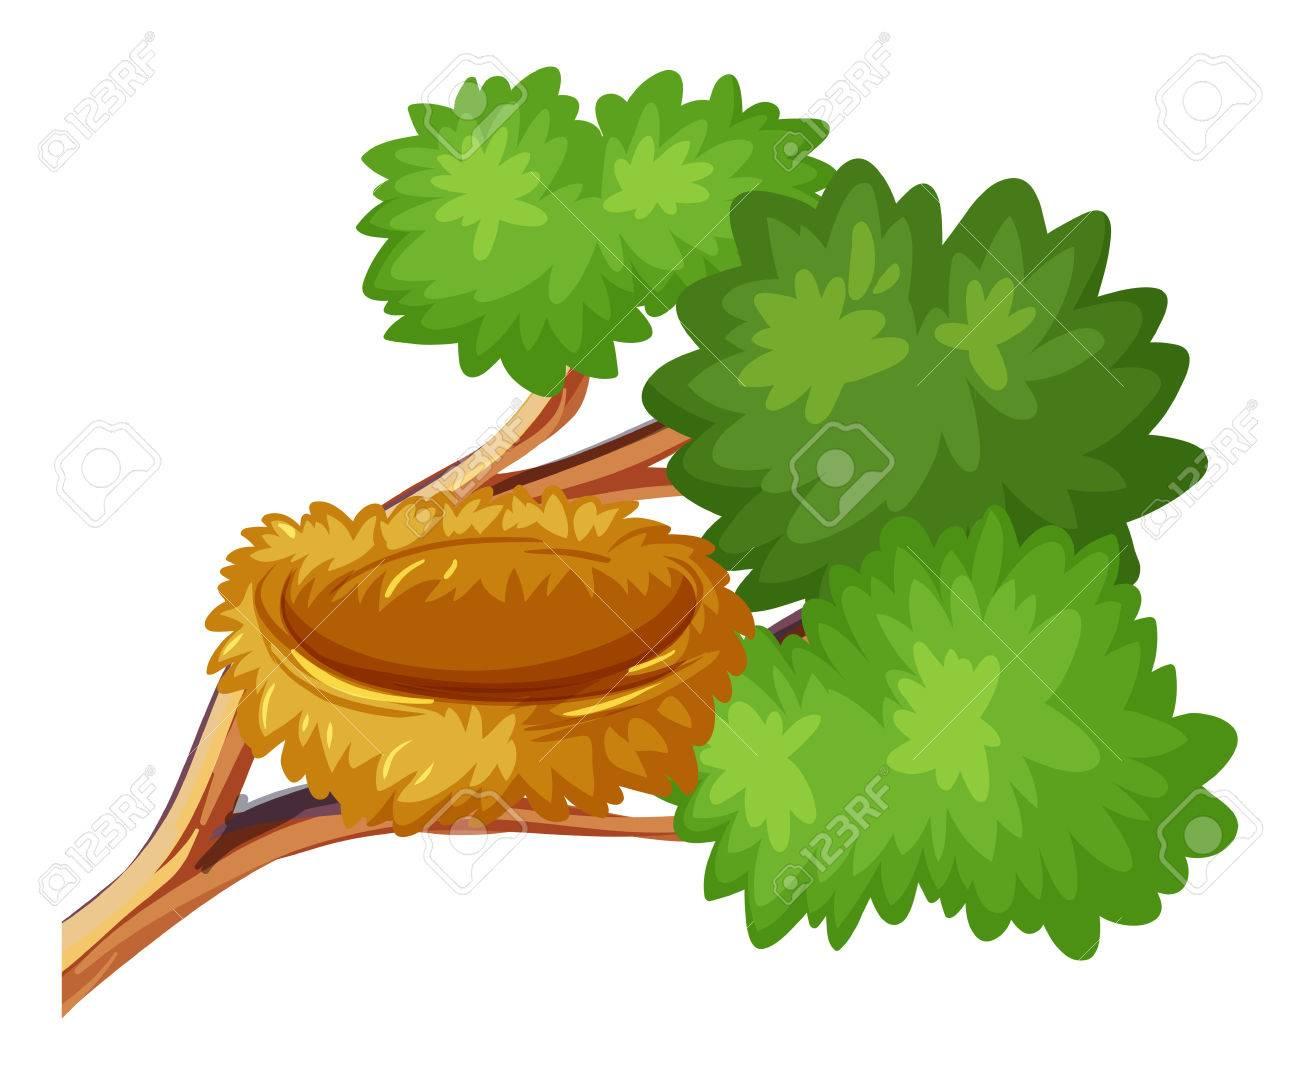 Bird nest on the branch illustration.